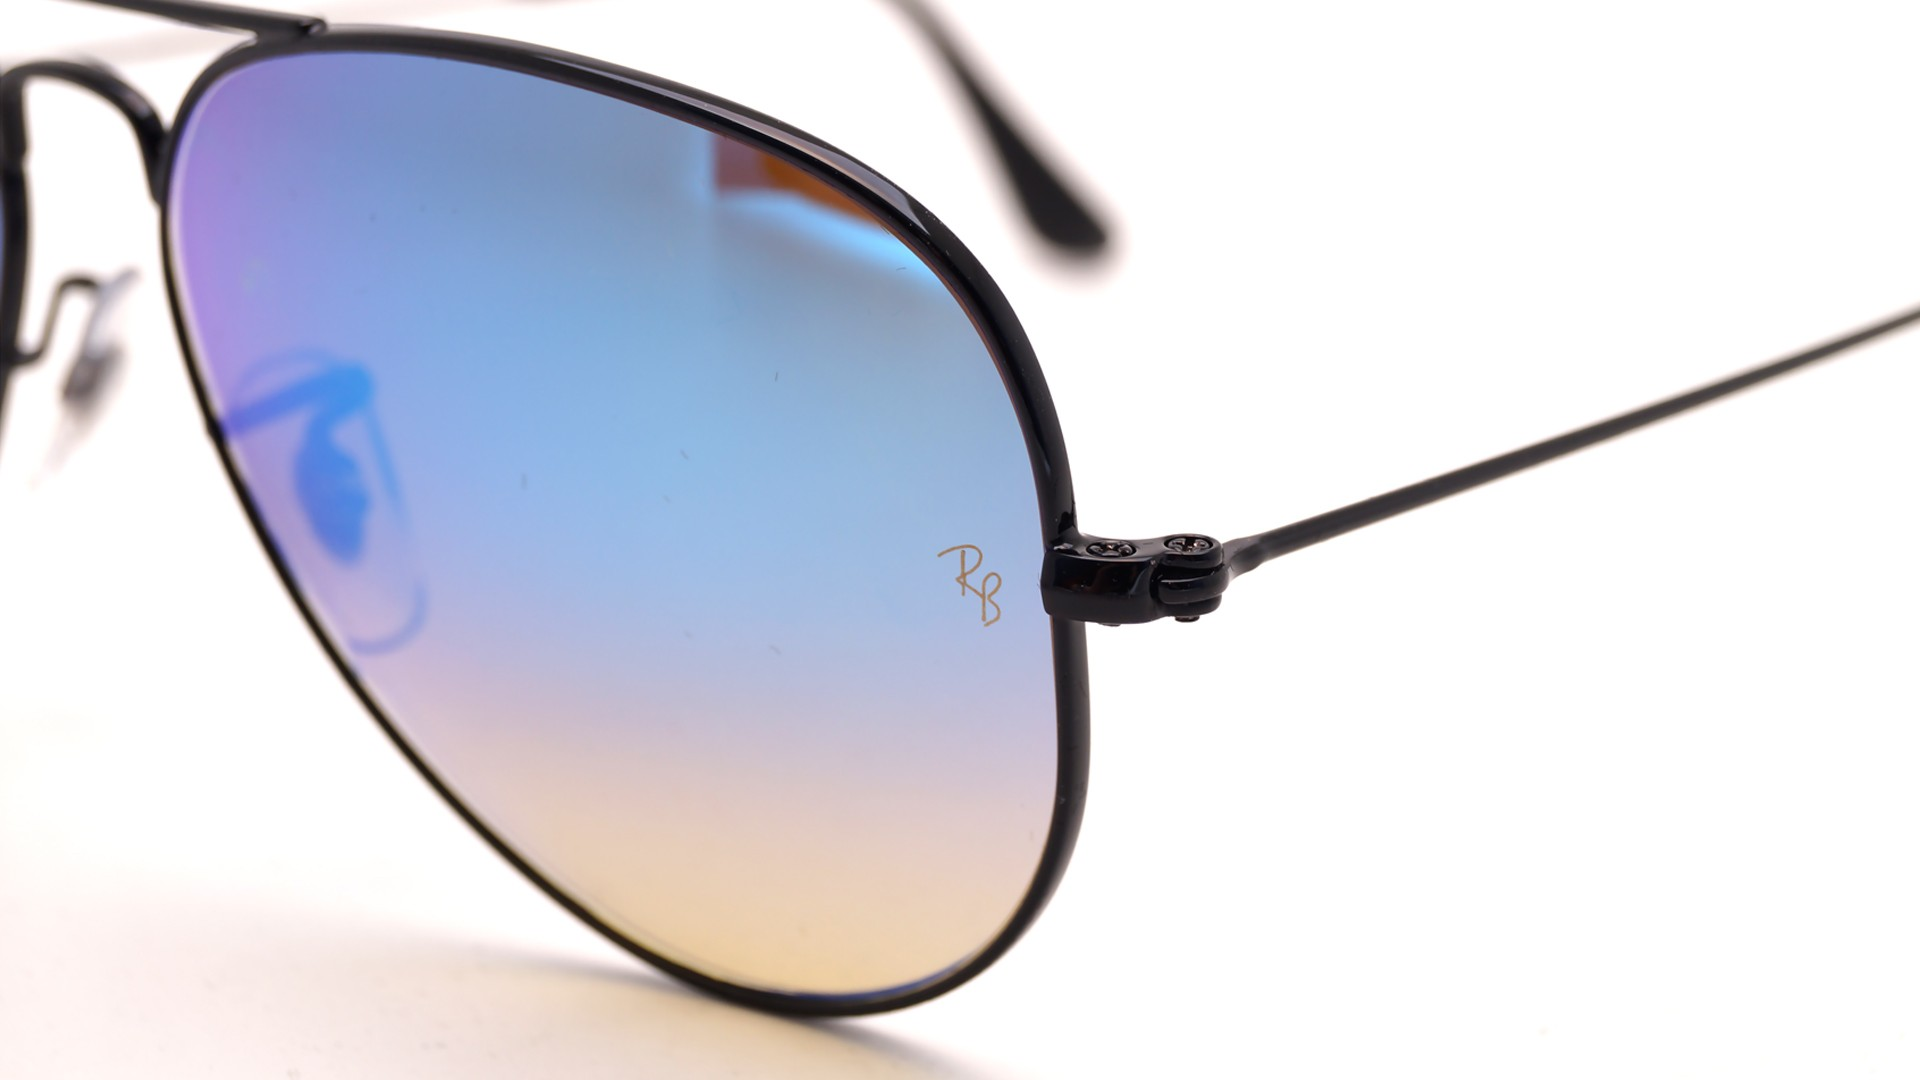 Ray ban aviator metal noir rb3025 002 4o 58 14 prix 114 for Lunettes de soleil ray ban aviator miroir